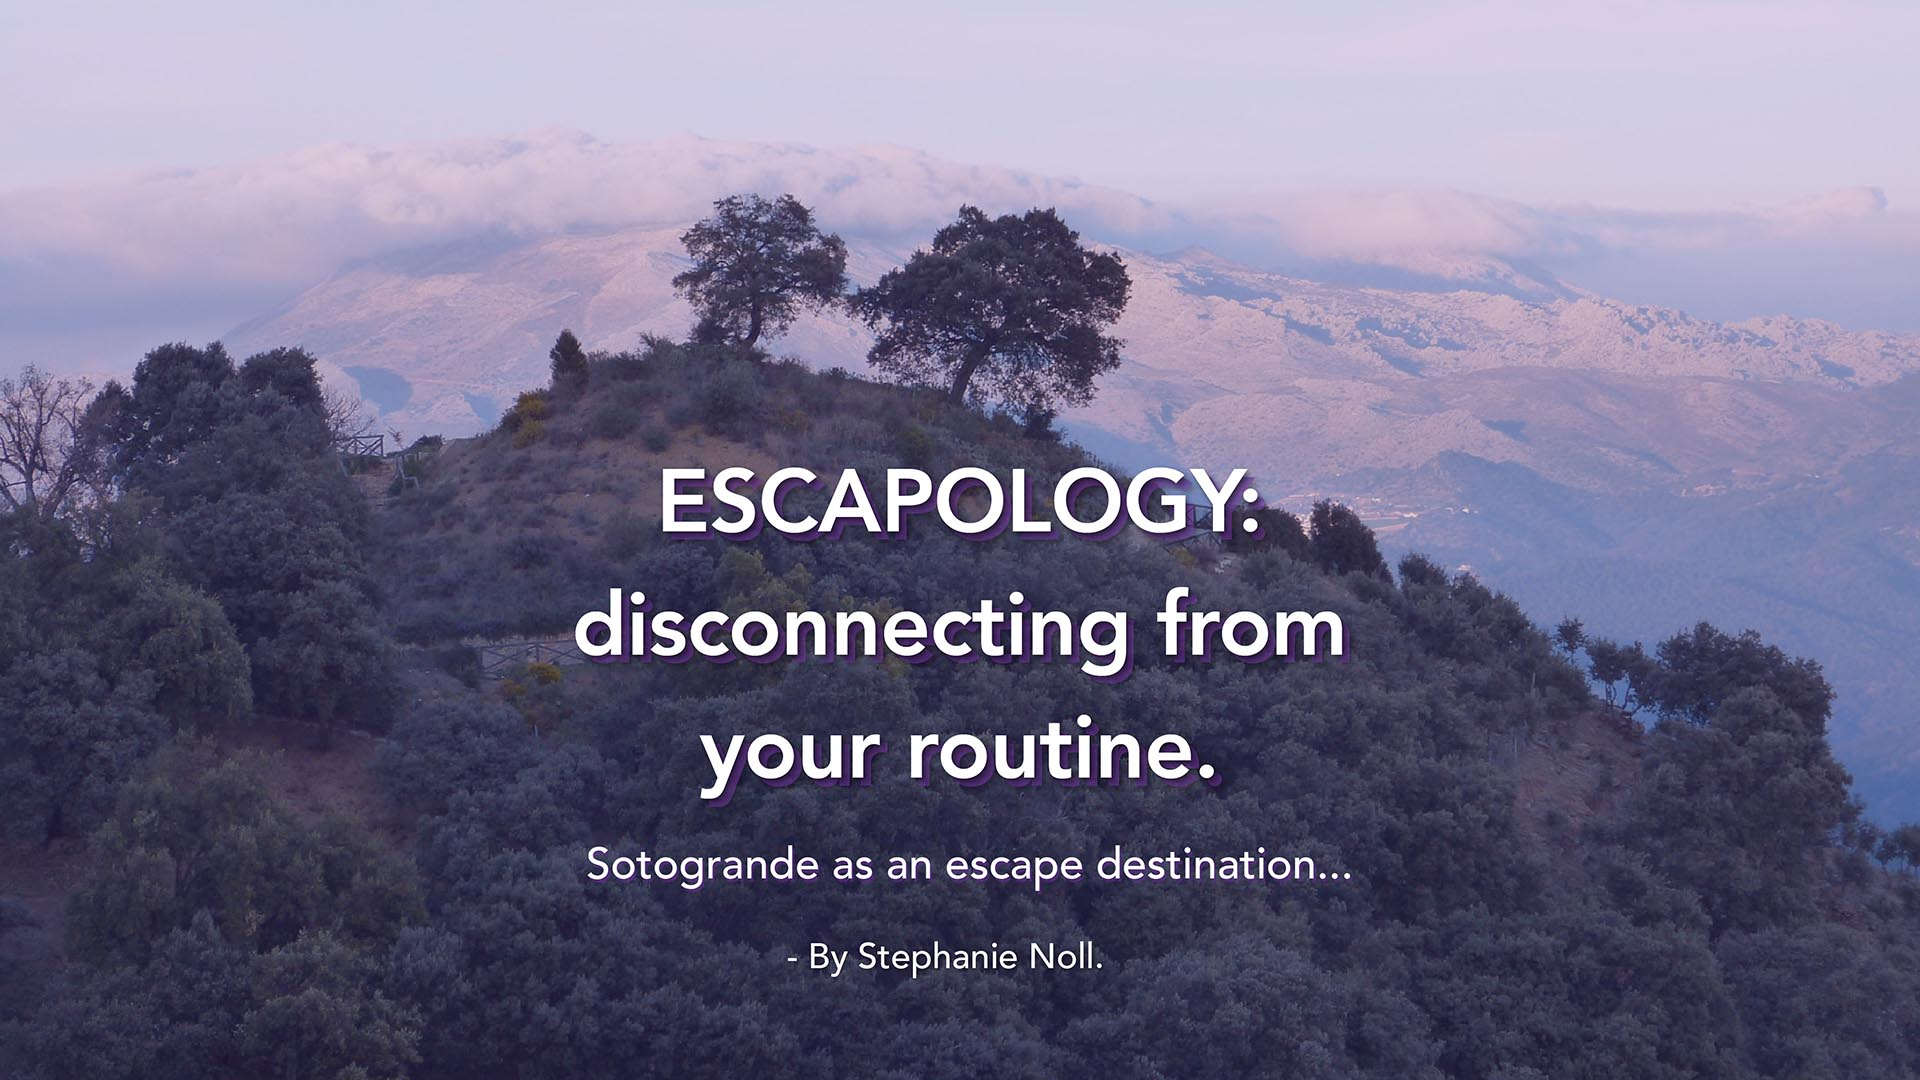 noll-sotogrande-blog-escapology-sotogrande-disconnecting-from-your-routine